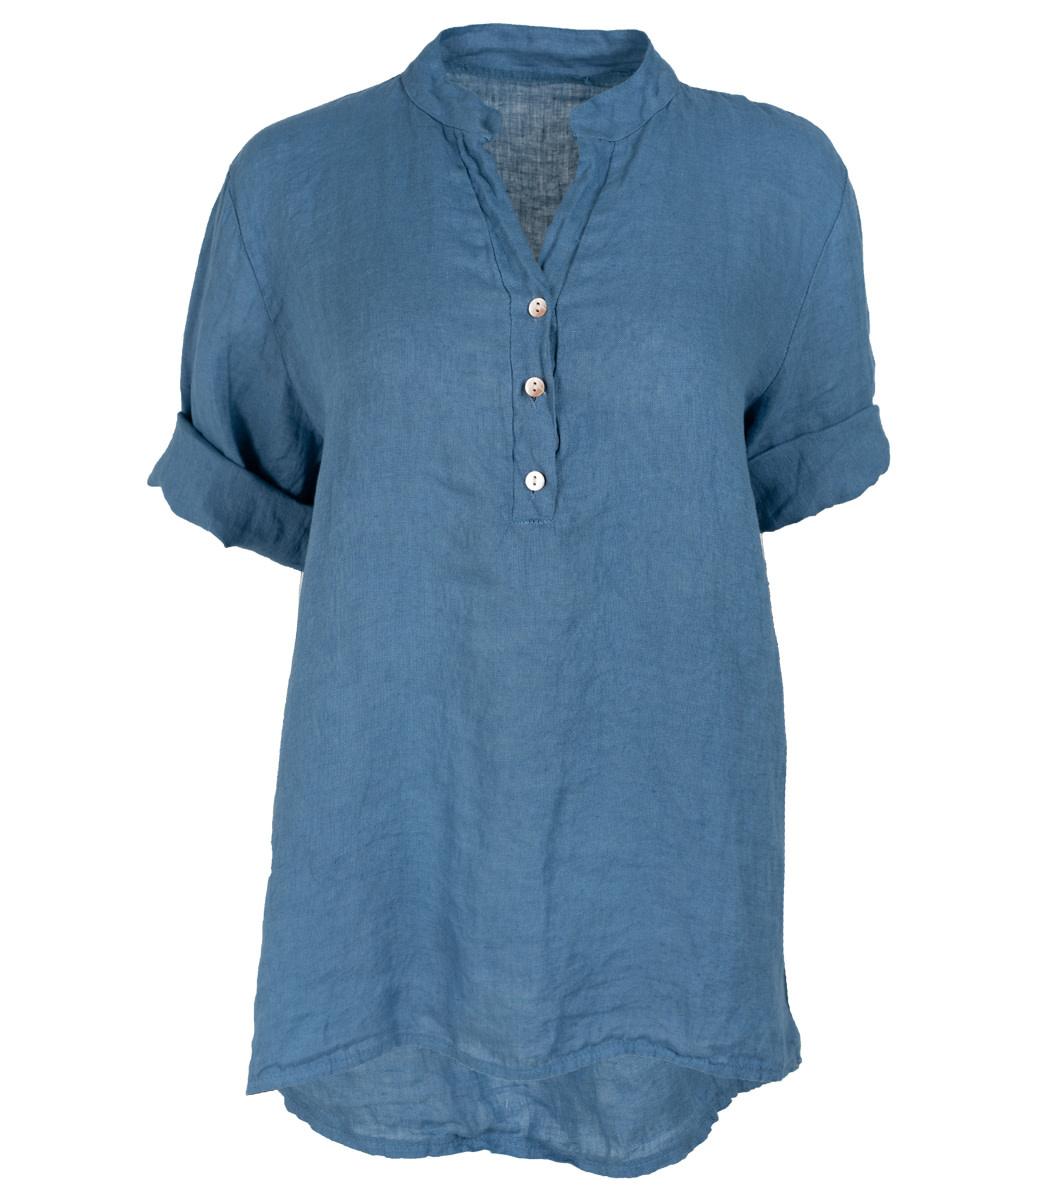 Wannahavesfashion Blouse jeansblauw linnen Kitty